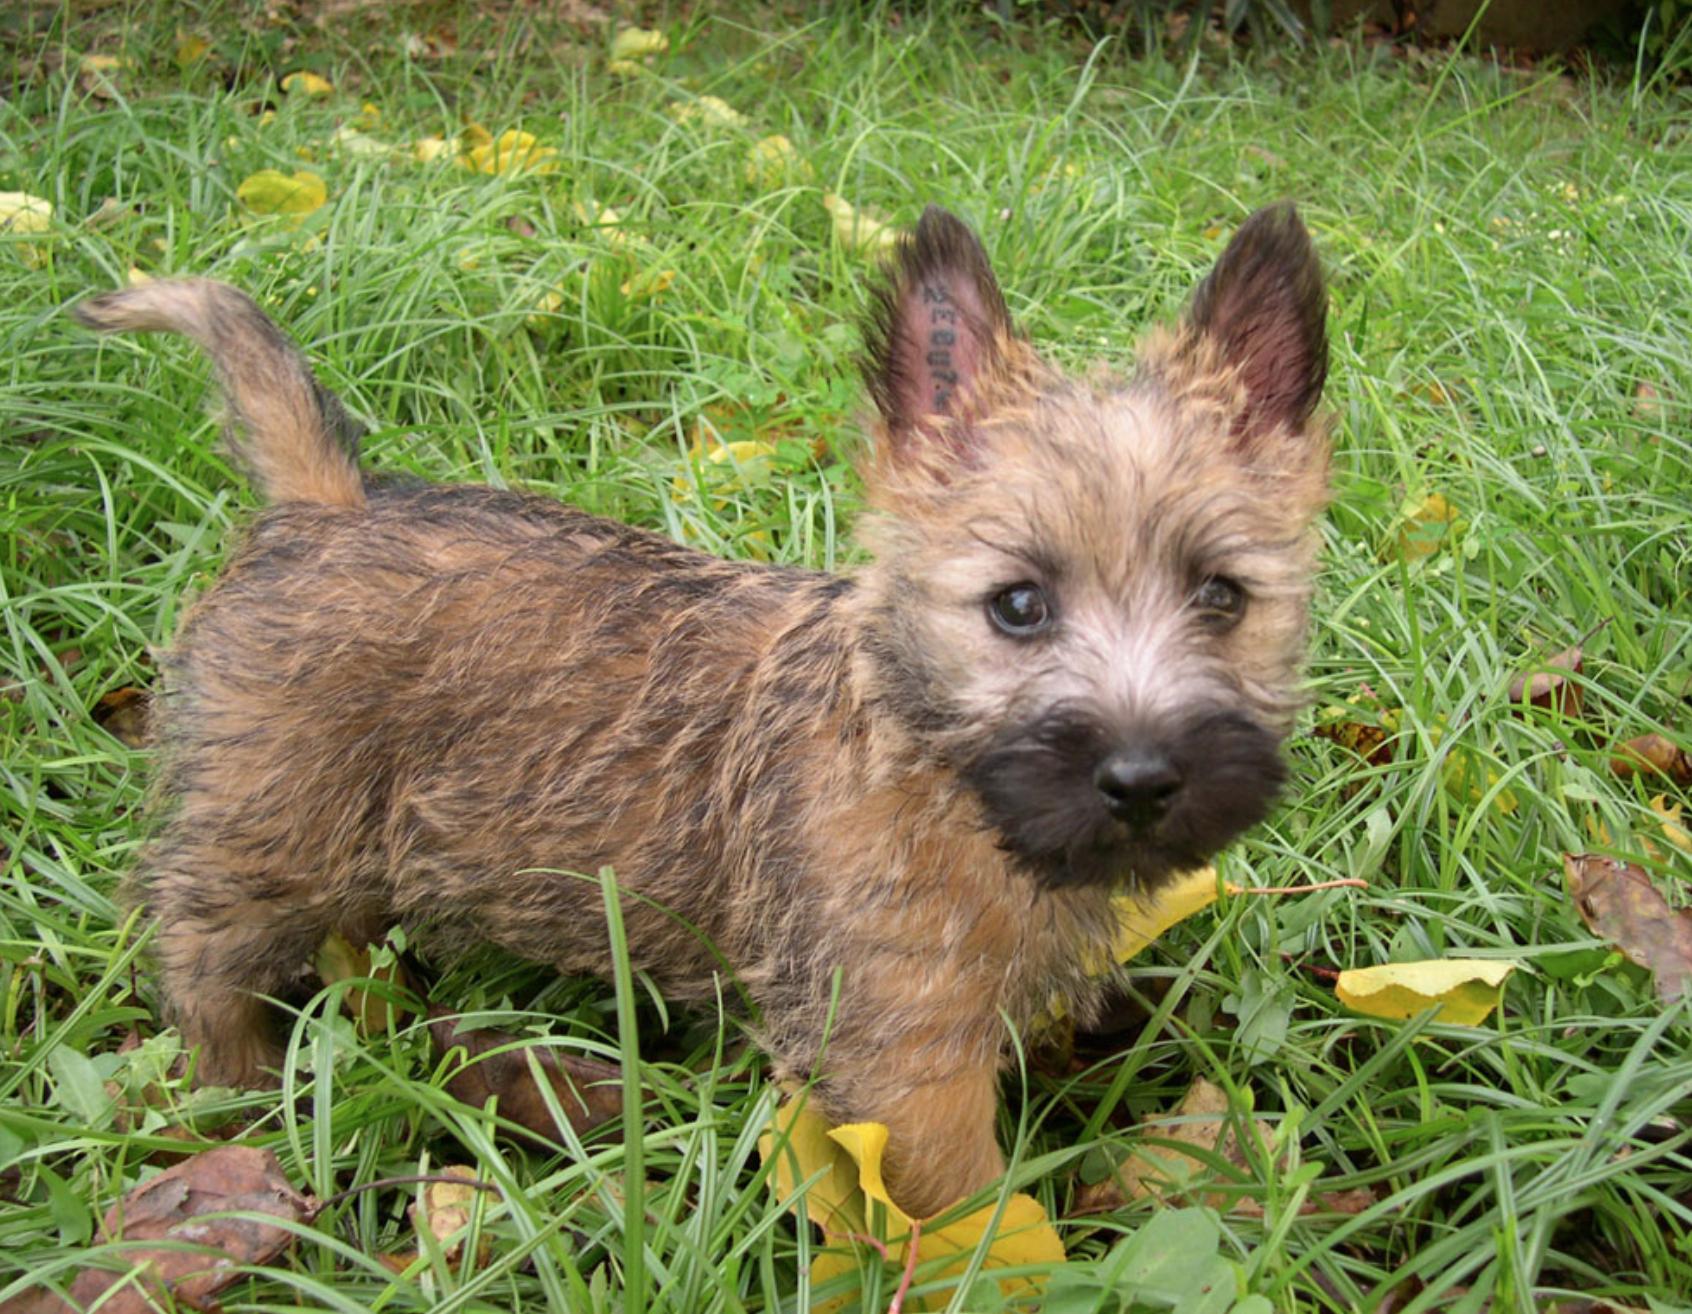 Cairn Terrier 3 Months Old Cairn Terrier Puppies Cairn Terrier Terrier Puppies